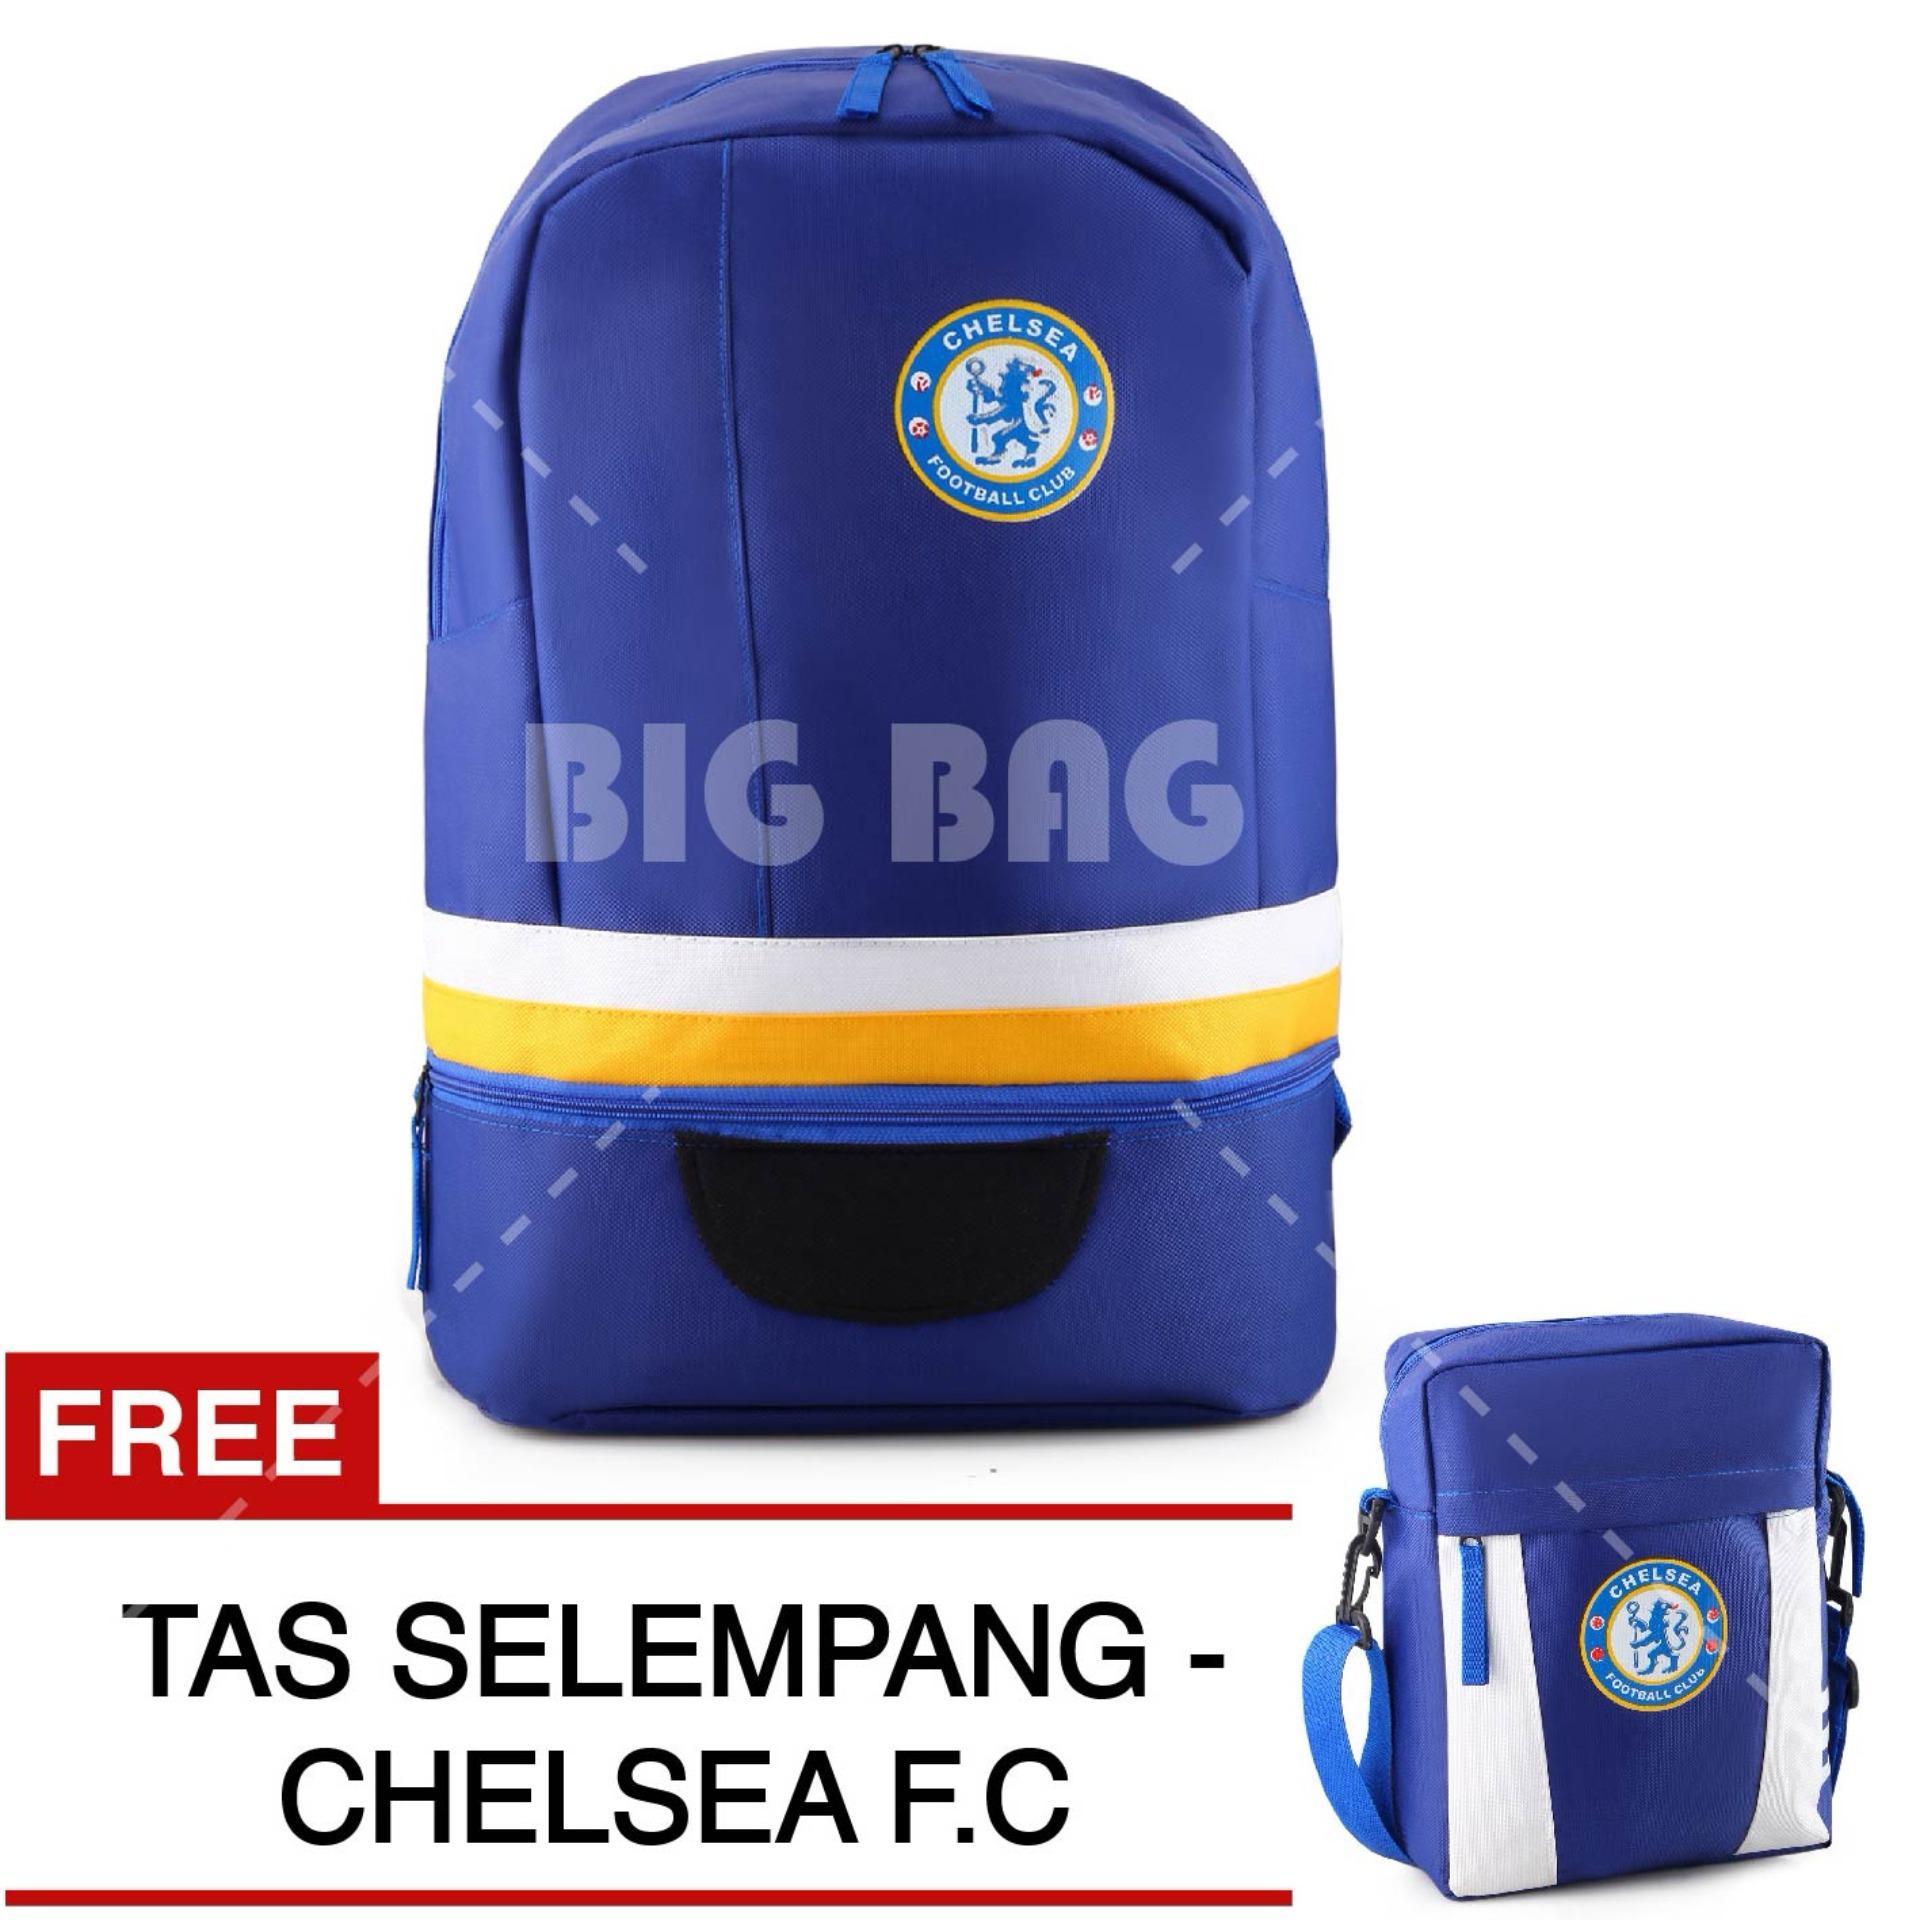 Toko Tas Ransel Bola Pria Chelsea Fc Laptop Backpack Men Soccer Editions Blue Free Tas Selempang Chelsea Fc Blue Terlengkap